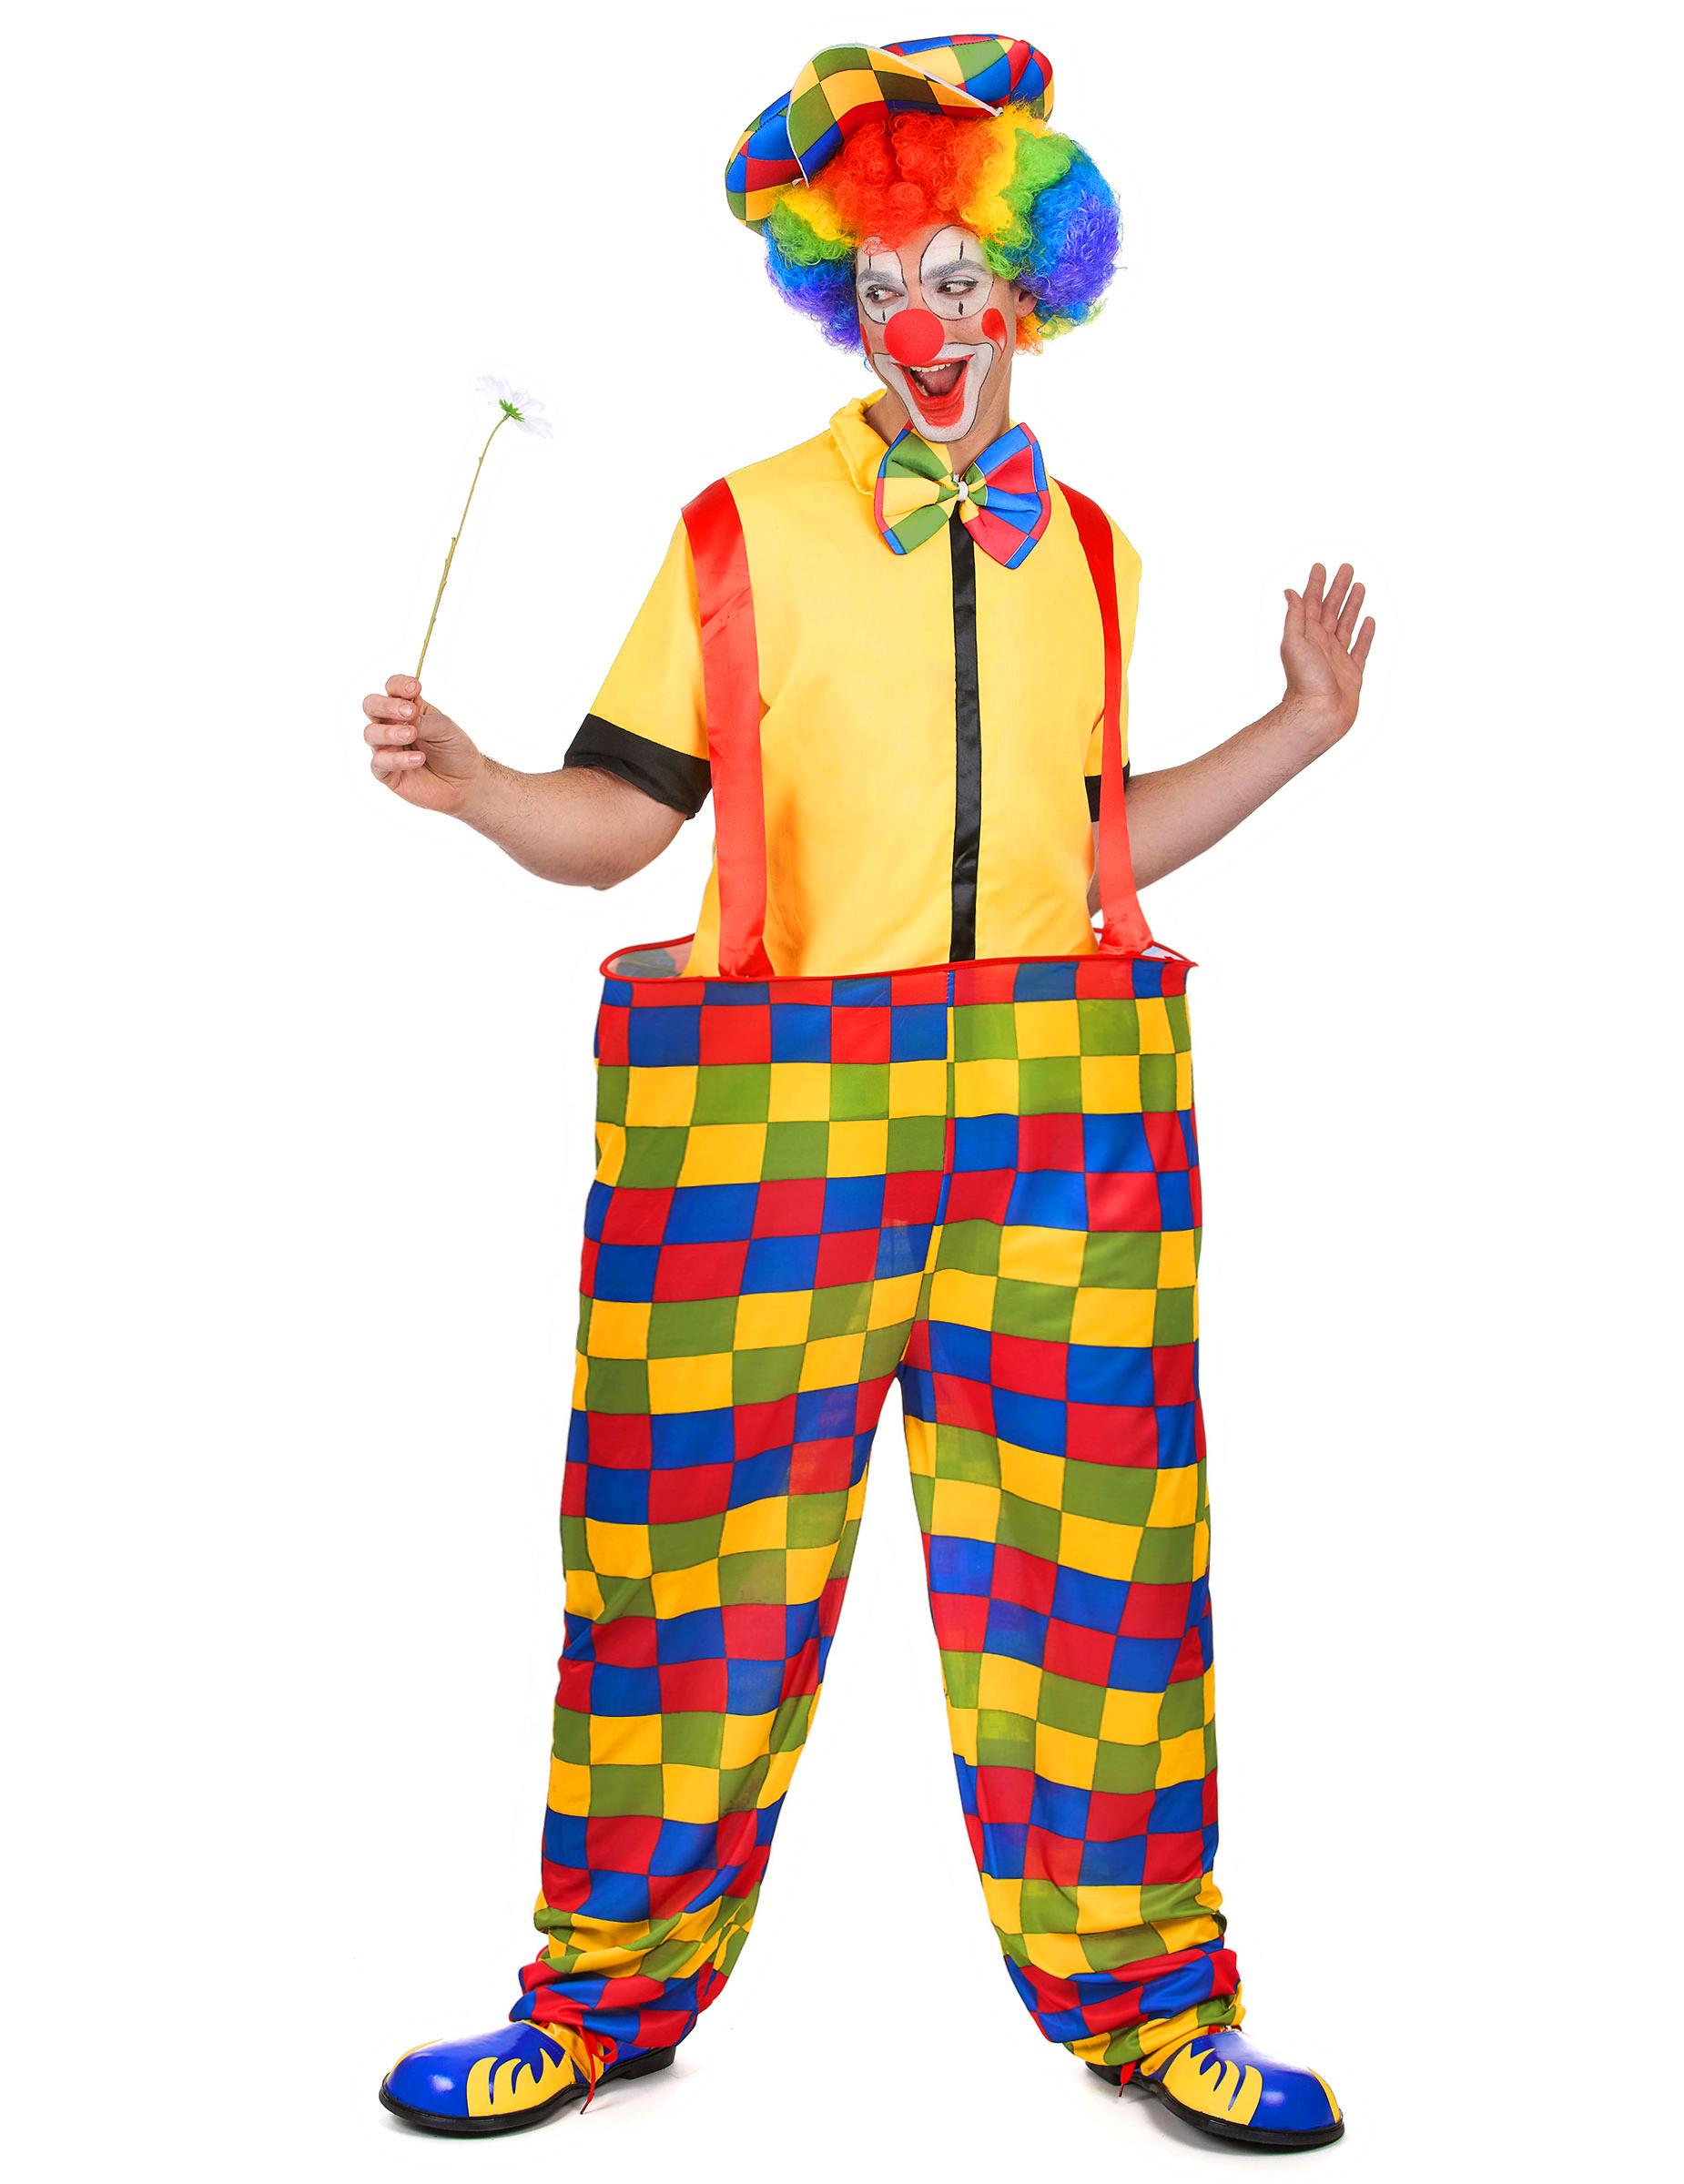 lustiger clown kost m zirkus bunt g nstige faschings kost me bei karneval megastore. Black Bedroom Furniture Sets. Home Design Ideas